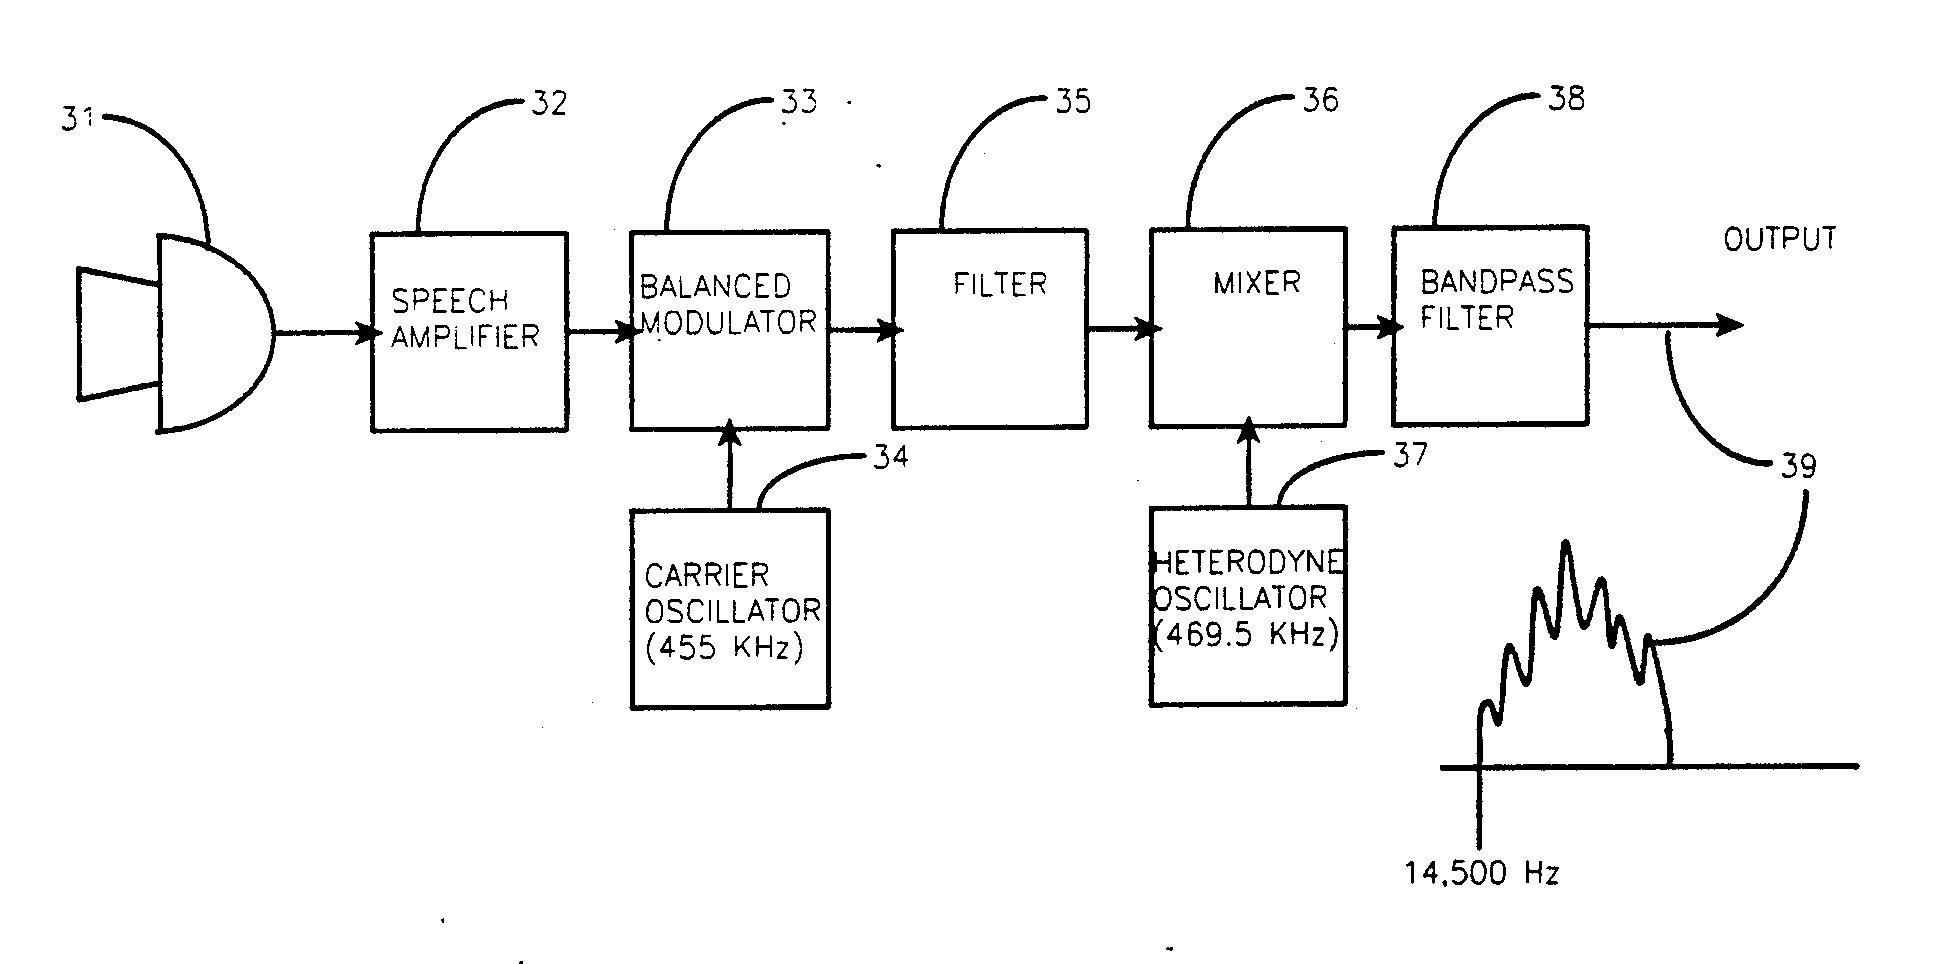 hight resolution of circuit block diagram wiring diagram today circuit block diagram examples circuit block diagram